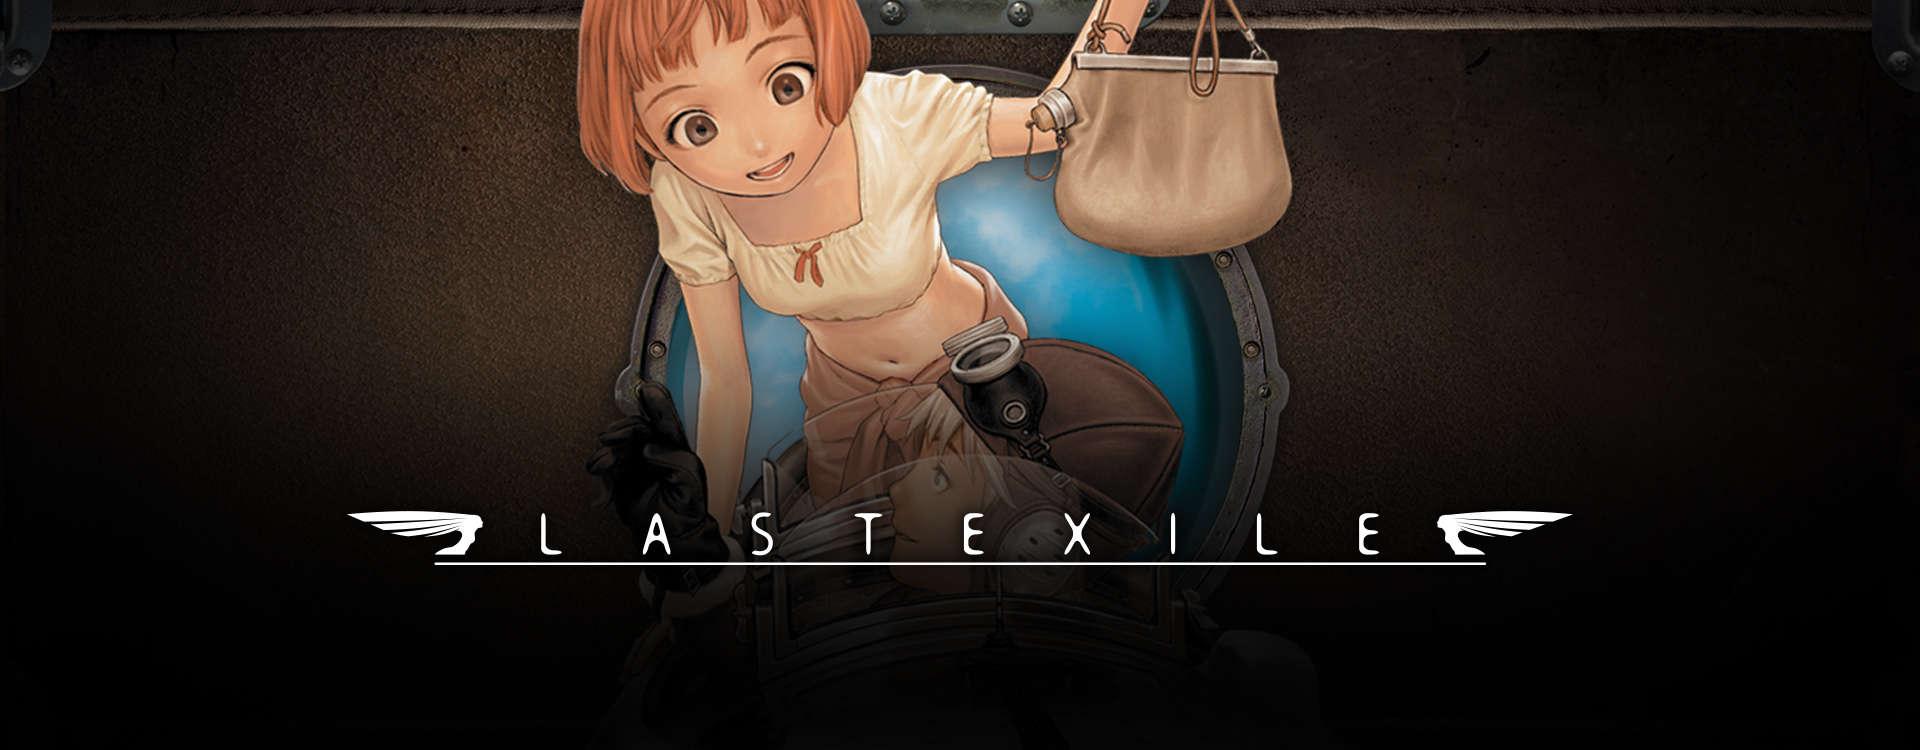 LASTEXILE -Fam, the Silver Wing